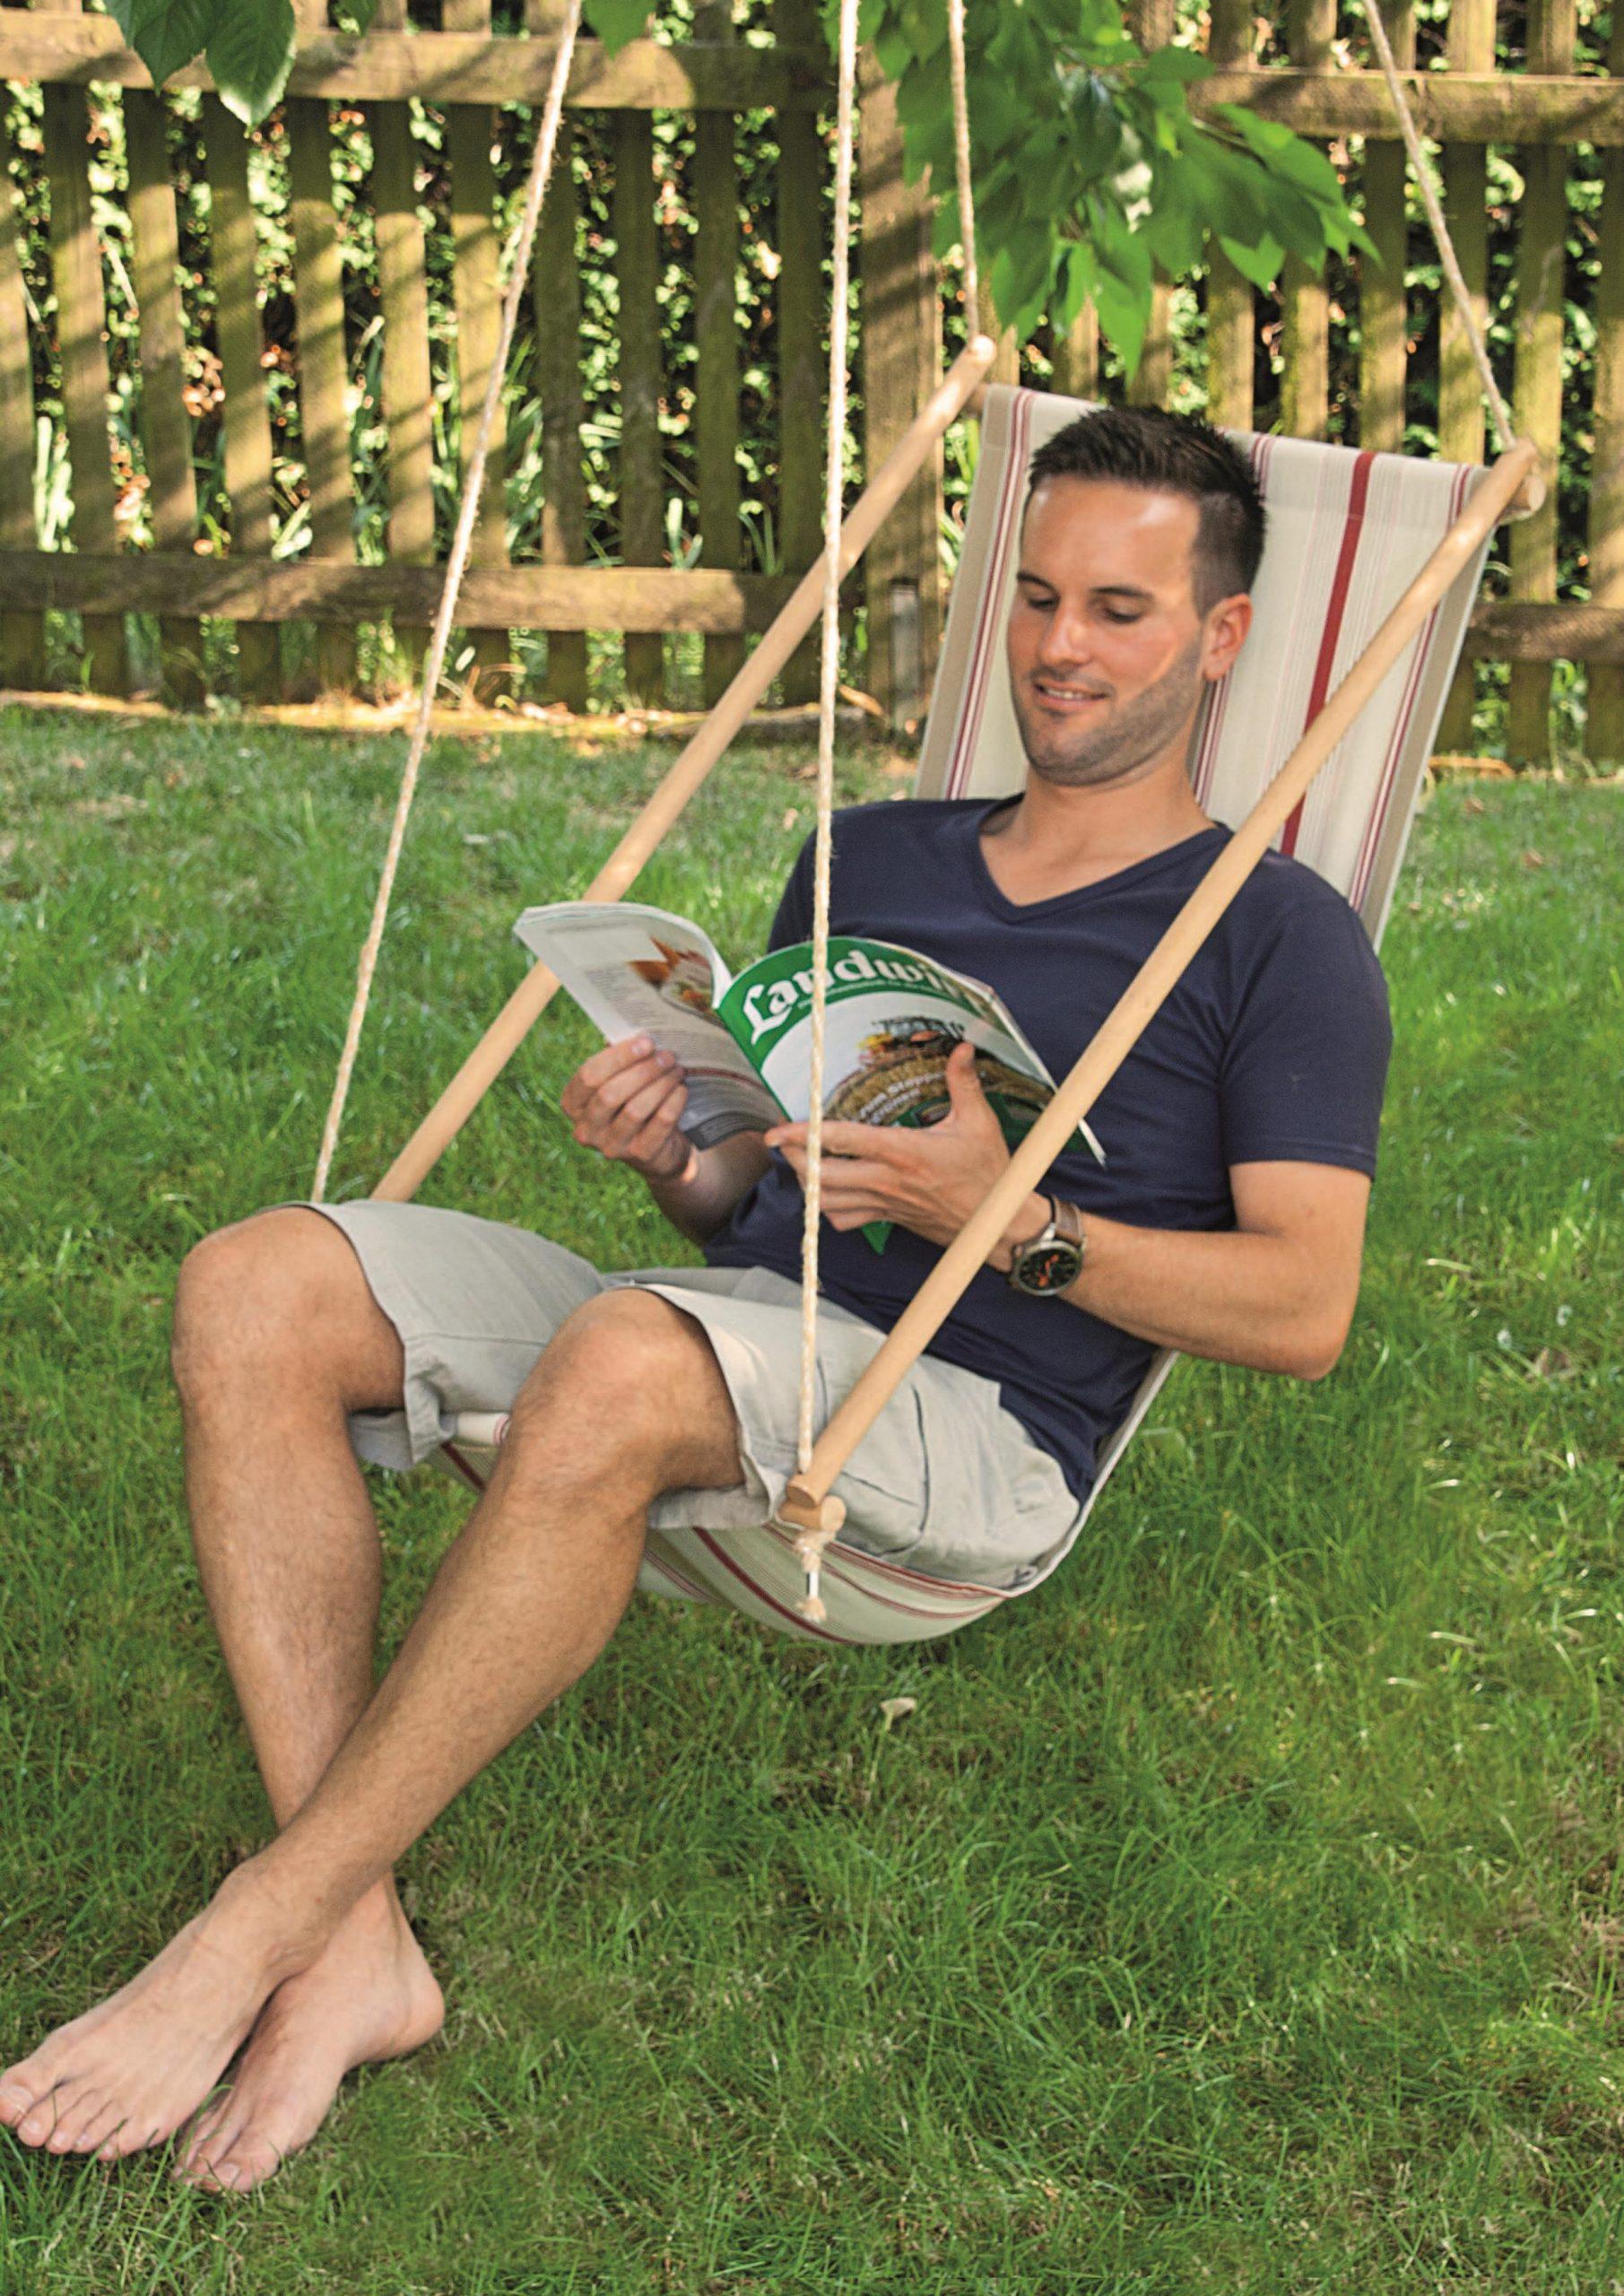 Full Size of Hängesessel Garten Relaxsessel Loungemöbel Holz Mini Pool Lounge Möbel Klettergerüst Kugelleuchten Schwimmbecken Beistelltisch Schaukel Sonnenschutz Garten Hängesessel Garten